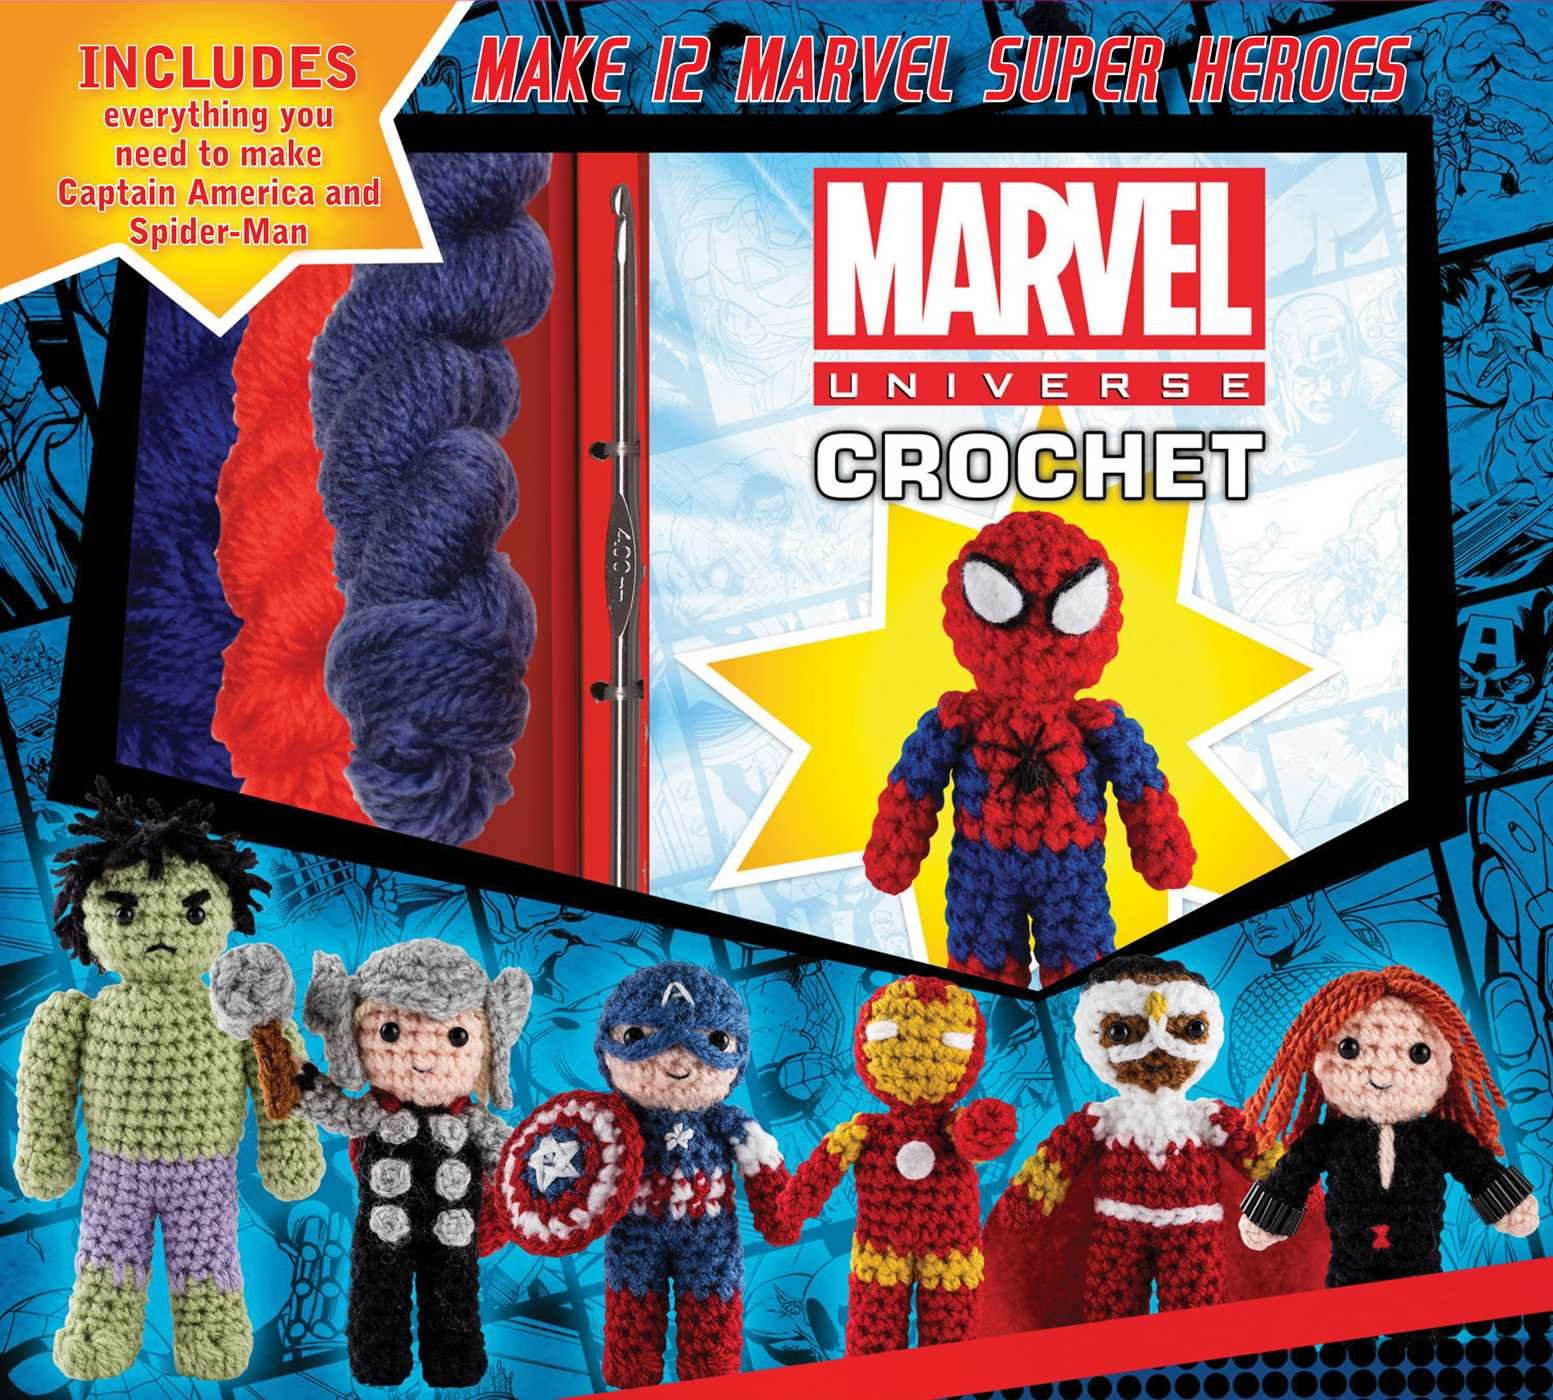 Marvel Universe Crochet (Crochet Kits): Kati Galusz: 9781626866553 ...